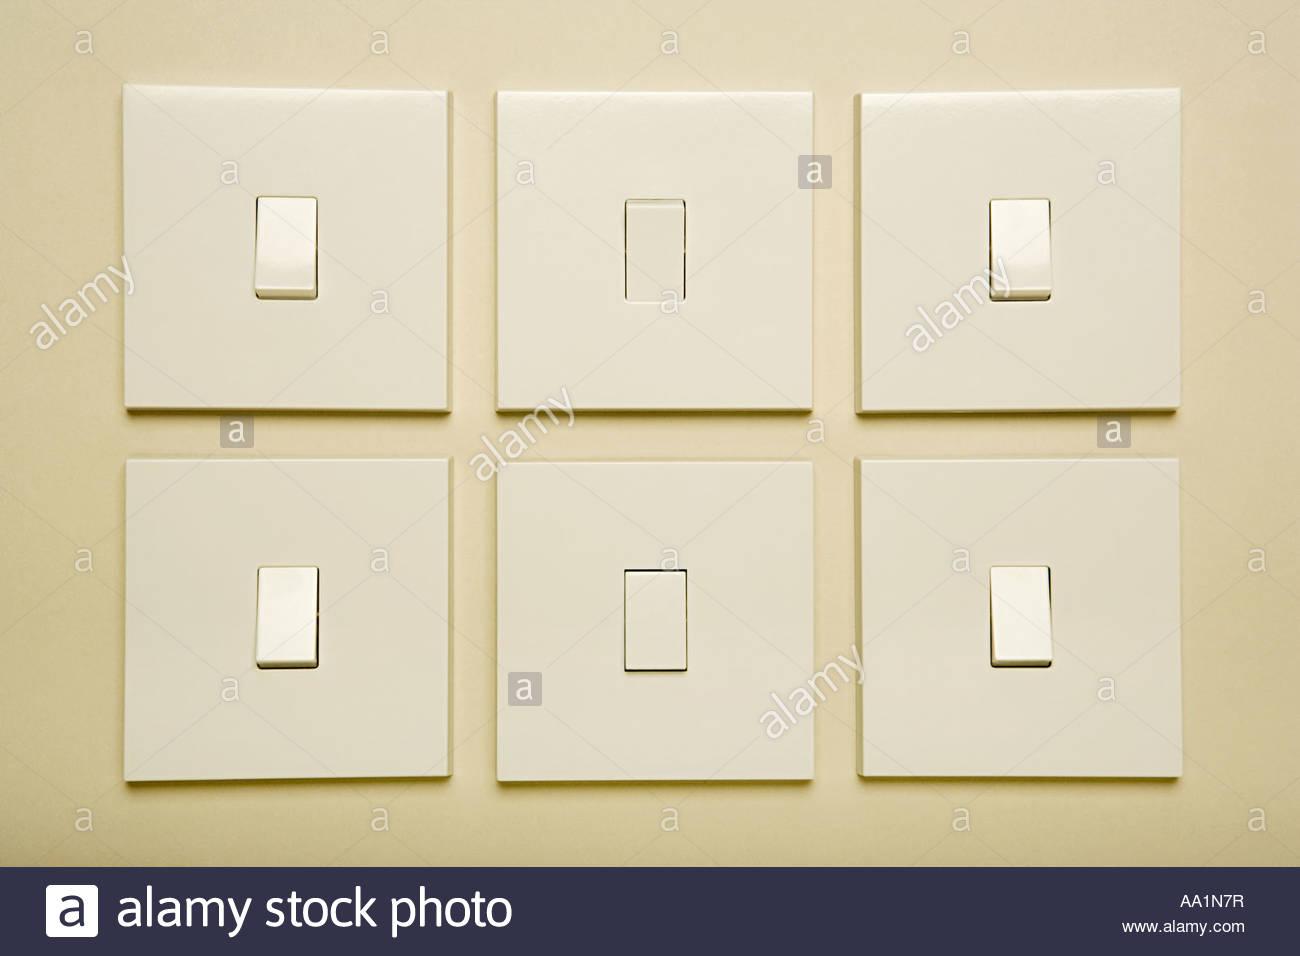 Light switches - Stock Image